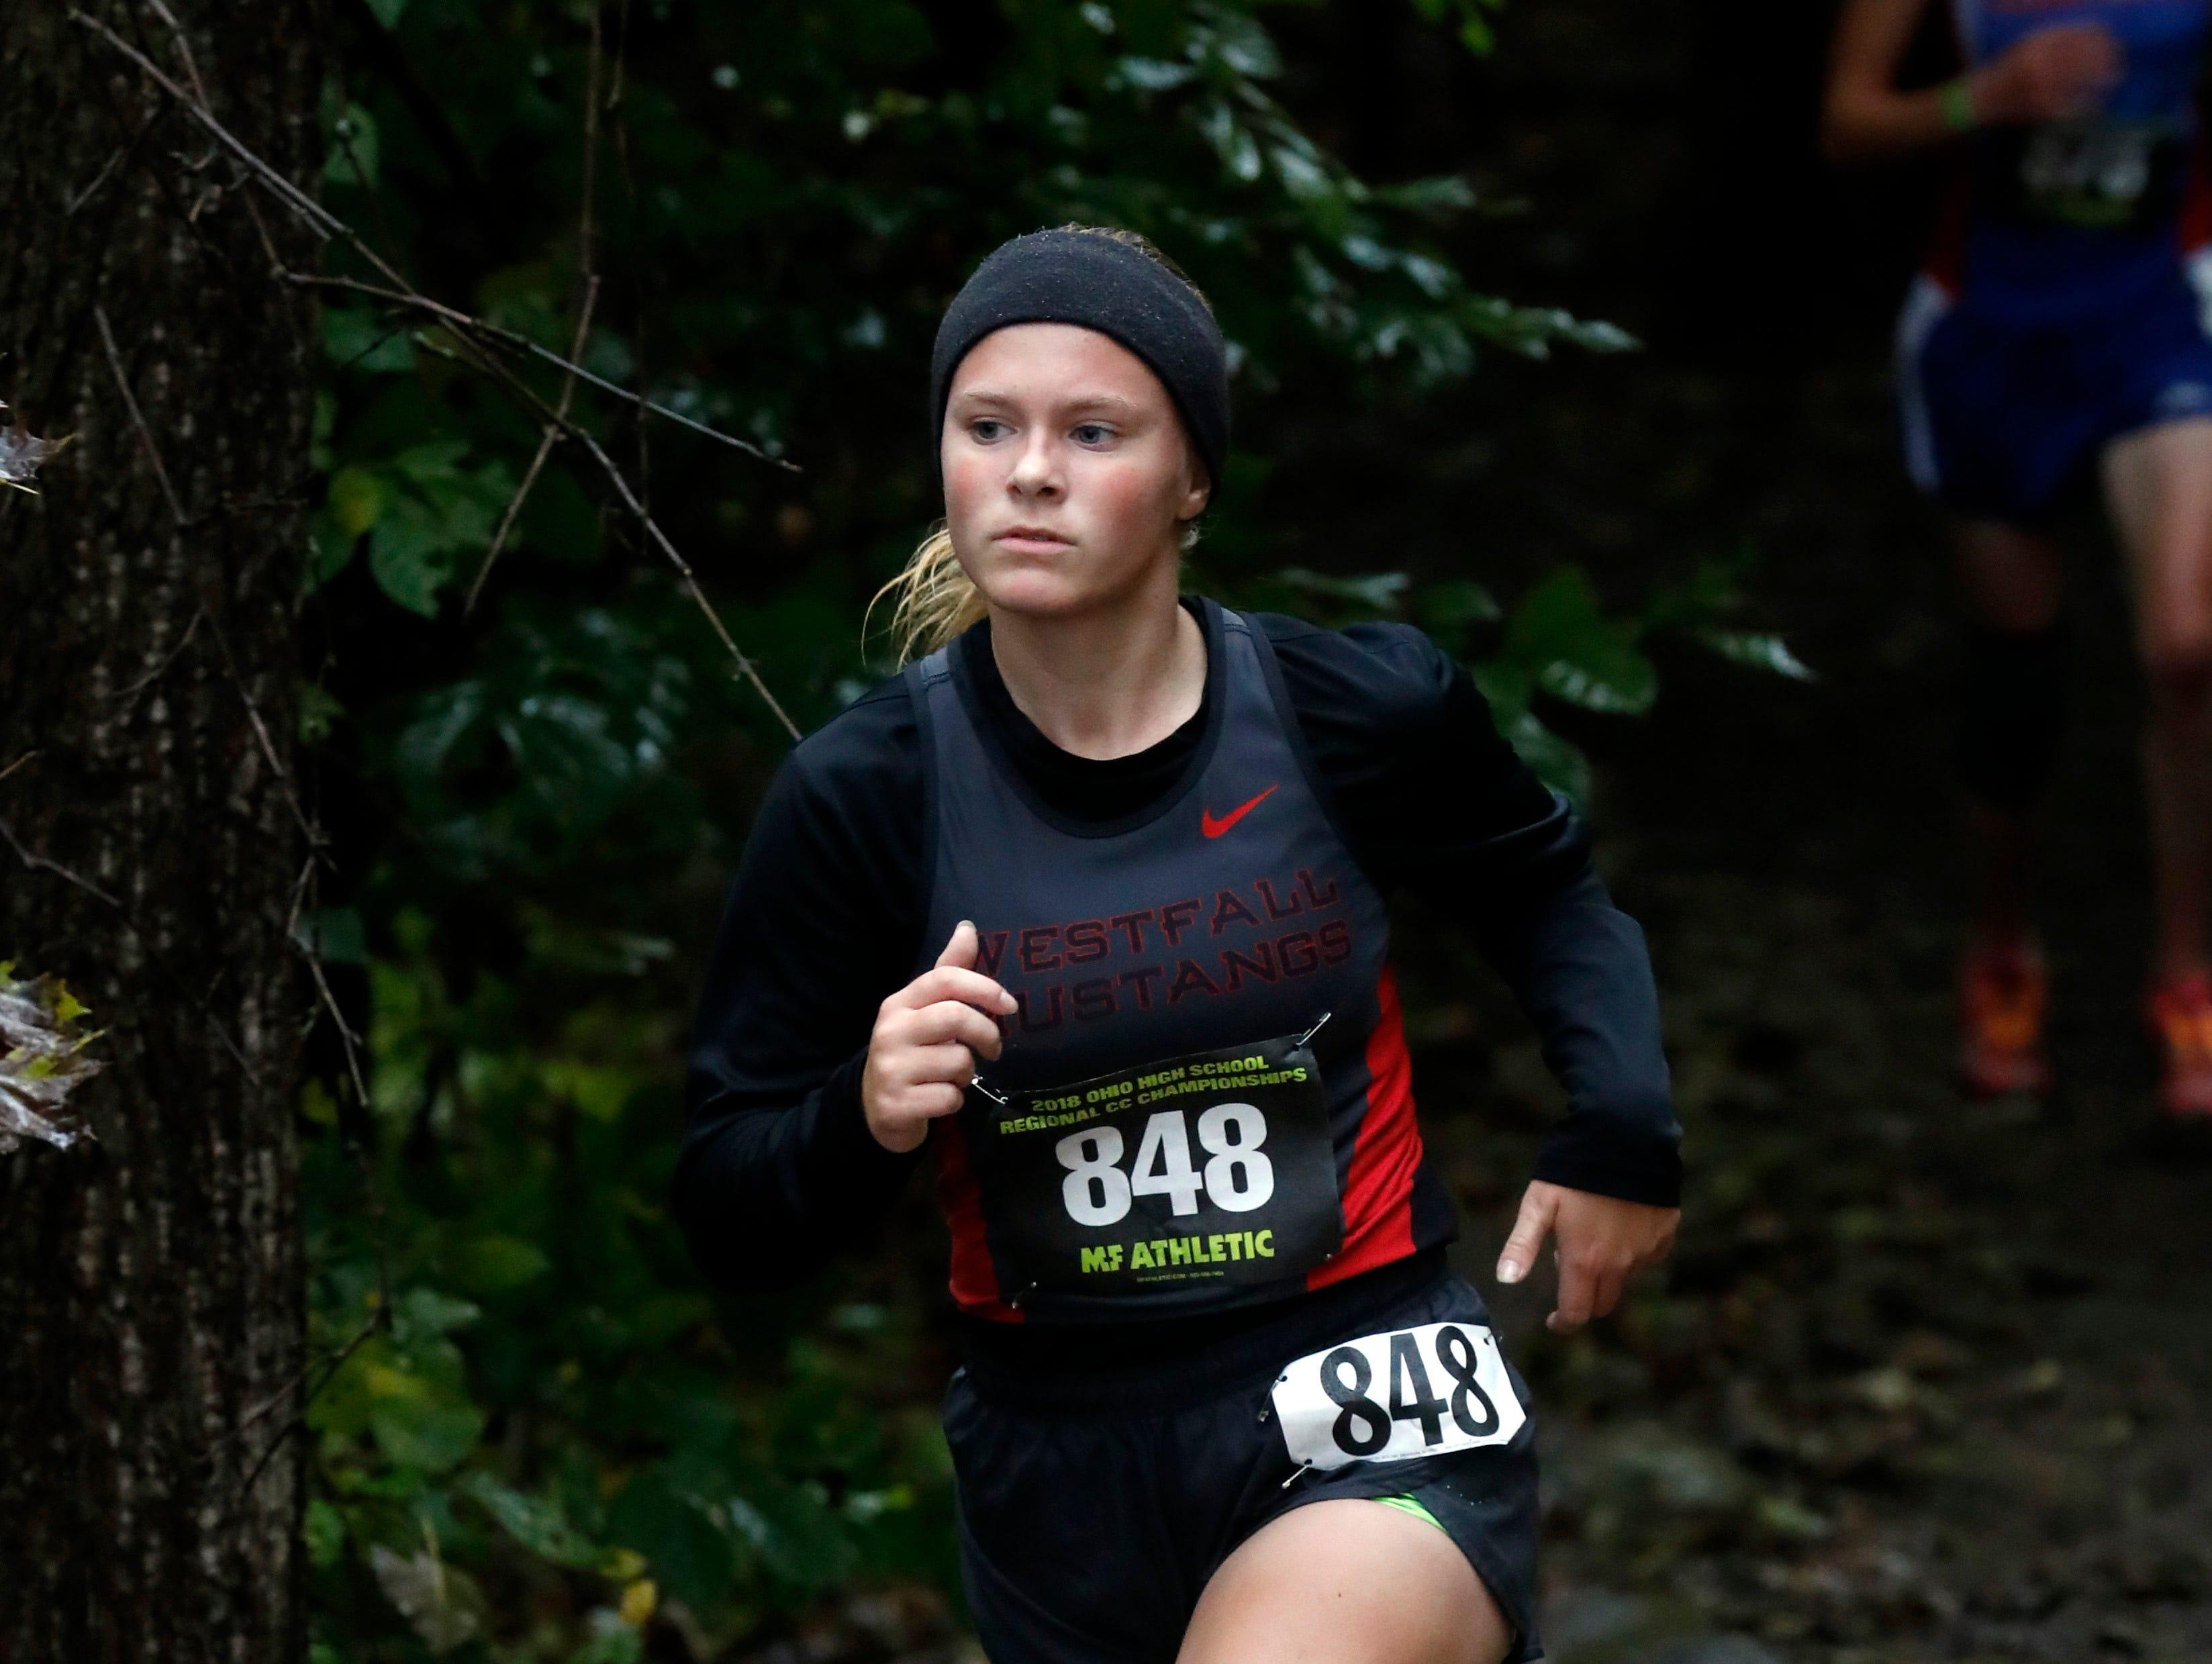 Westfall's Kylee Henry runs in the Regional Cross Country meet Saturday, Oct. 27, 2018, at Pickerington North High School in Pickerington.